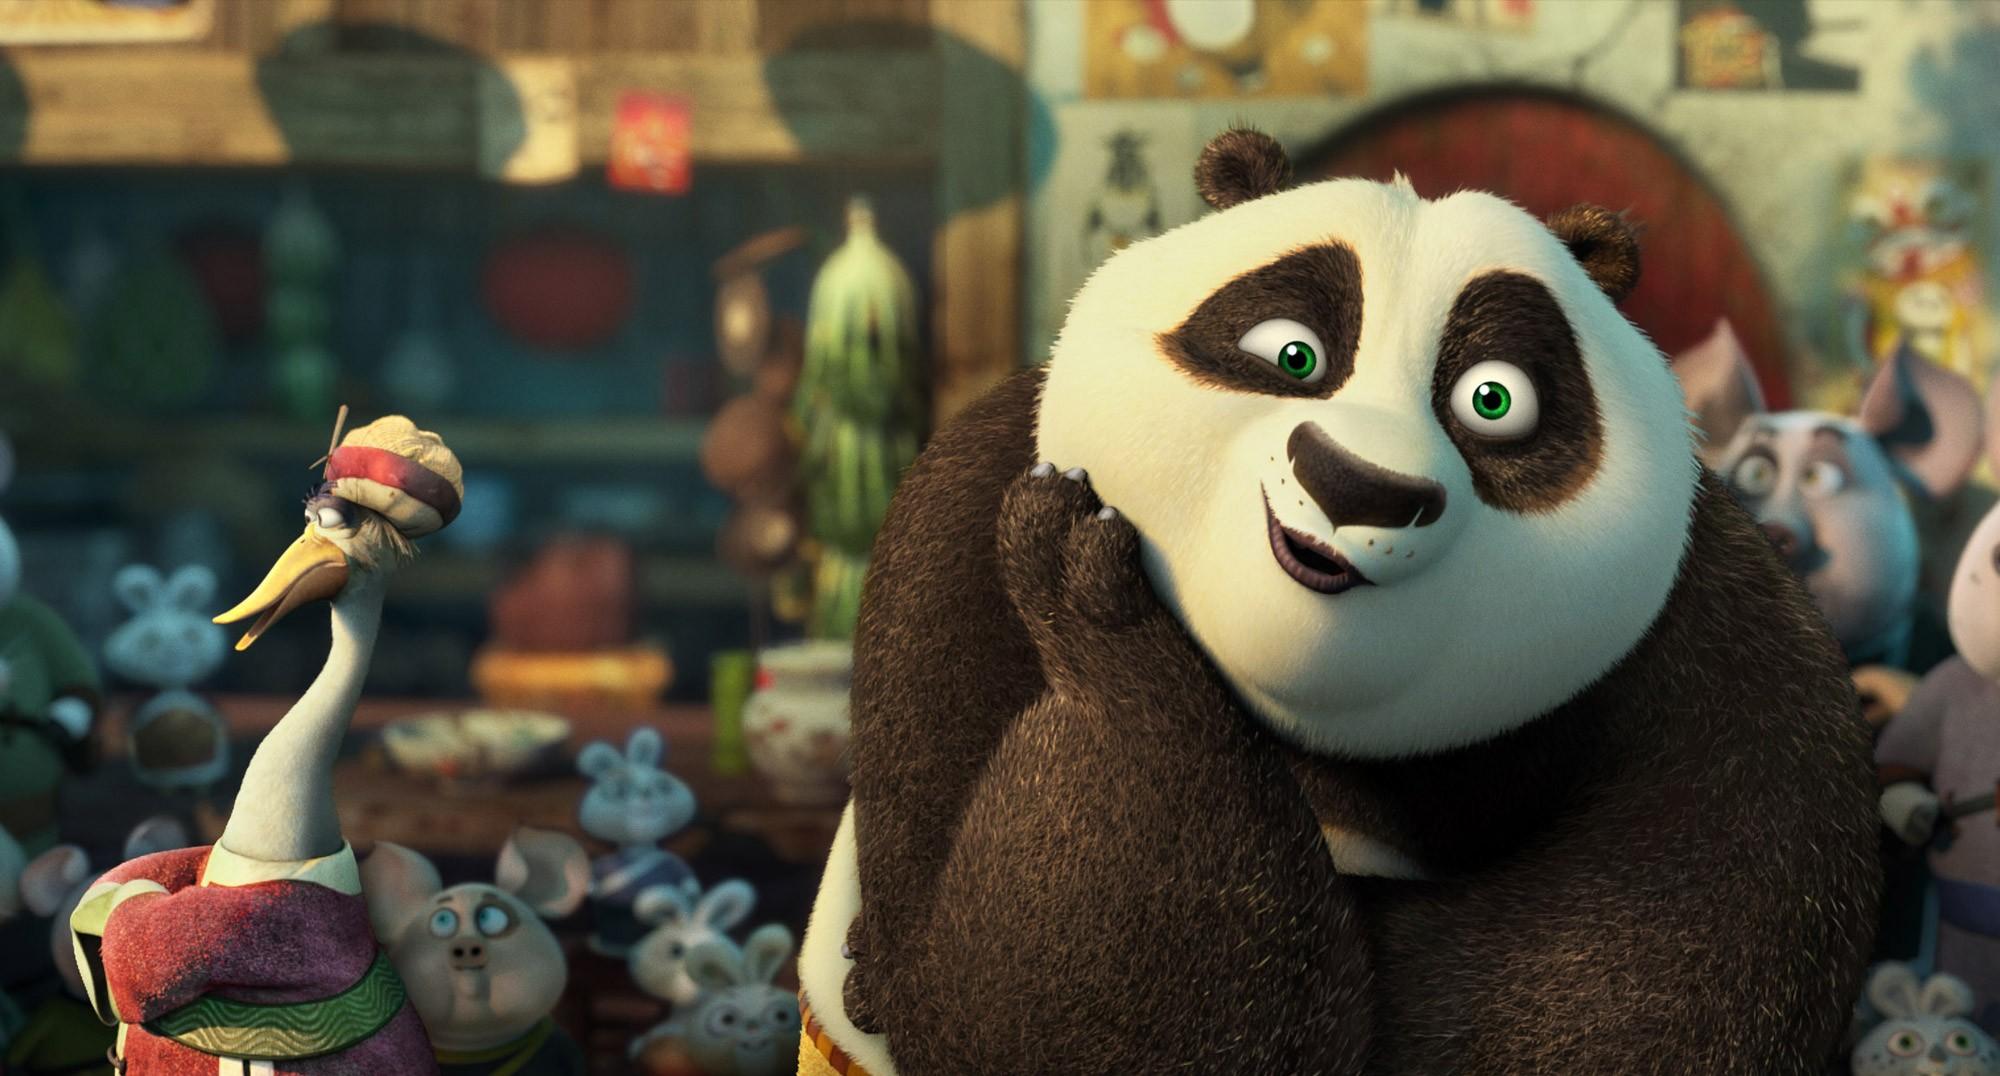 kung fu panda 3 wallpapers movie hq kung fu panda 3 pictures 4k wallpapers 2019 kung fu panda 3 wallpapers movie hq